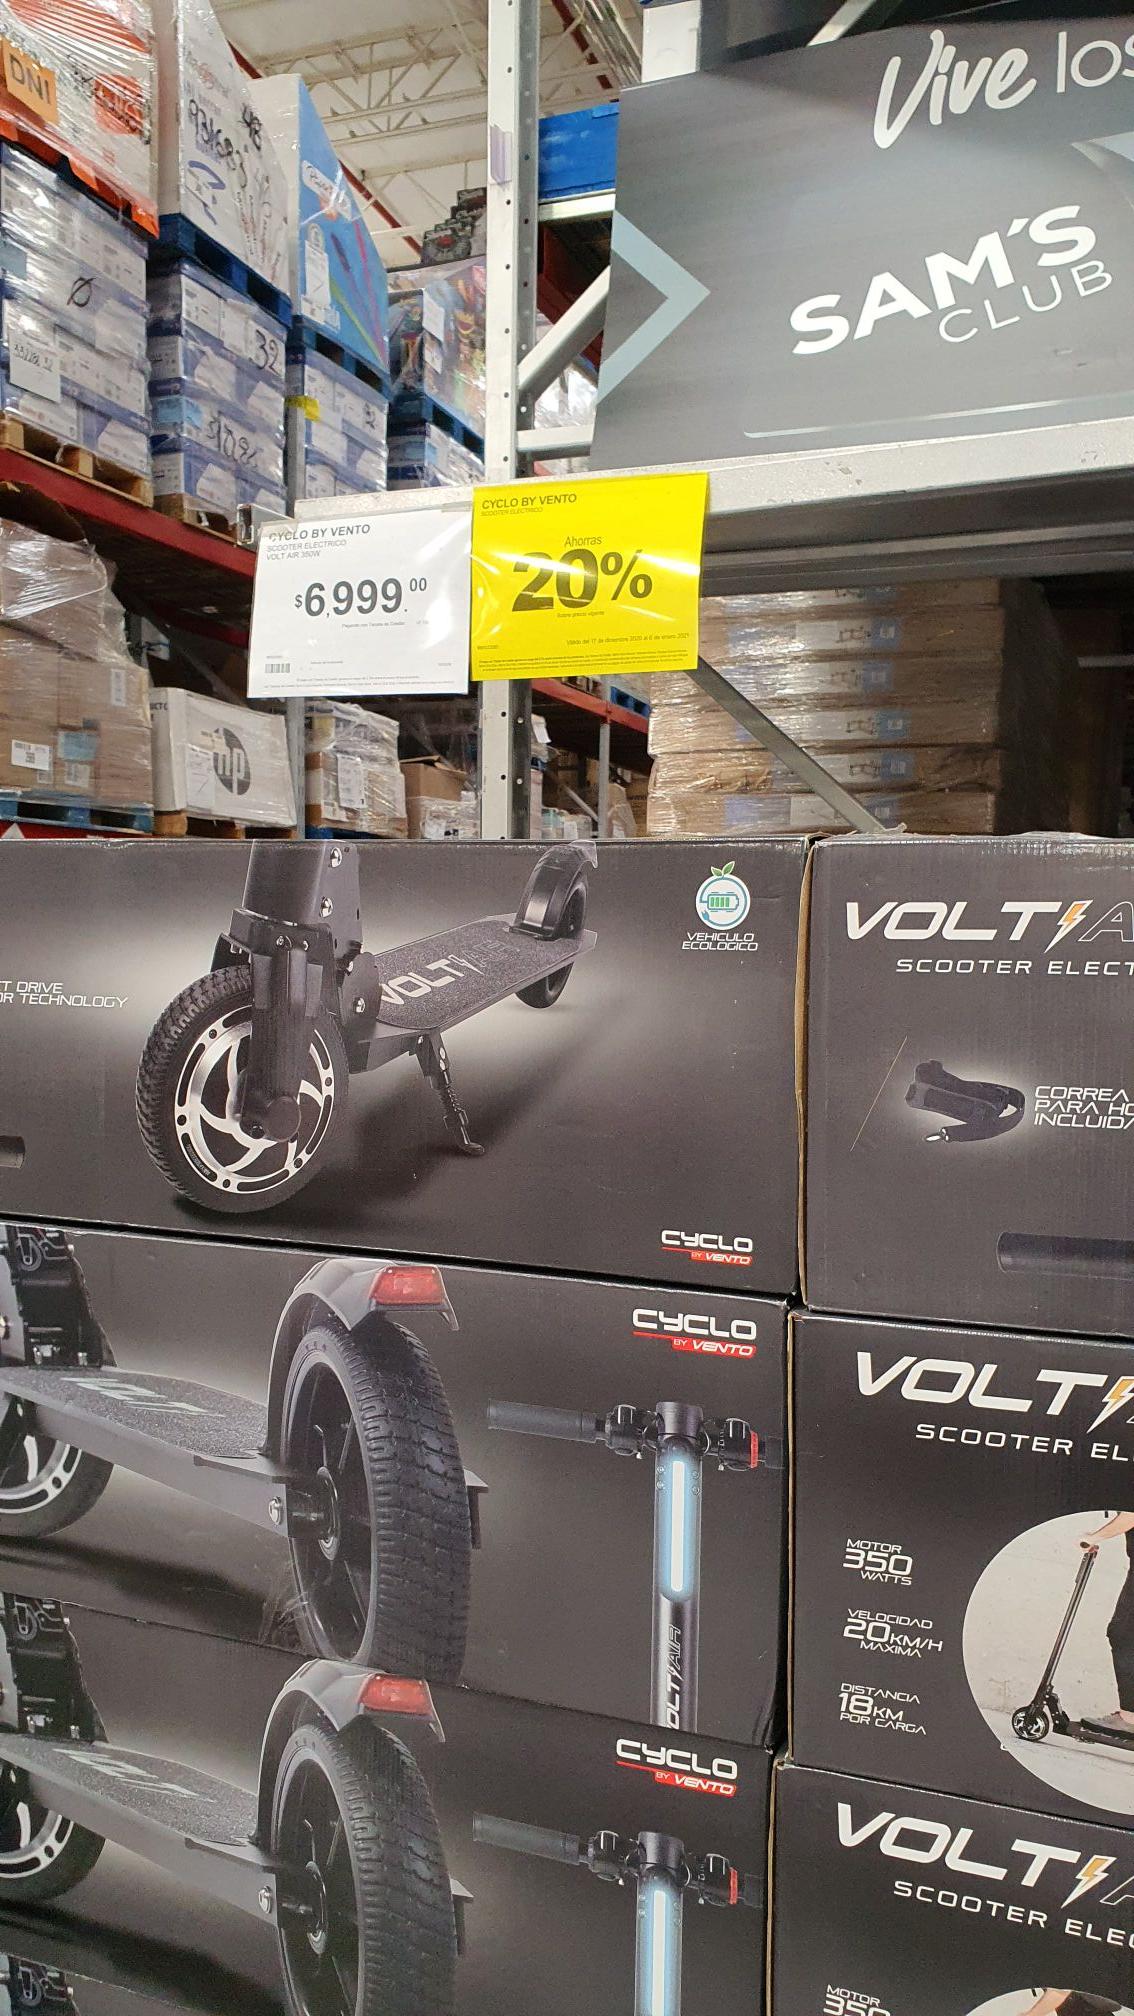 Scooter marca vento sams salamanca $5,600